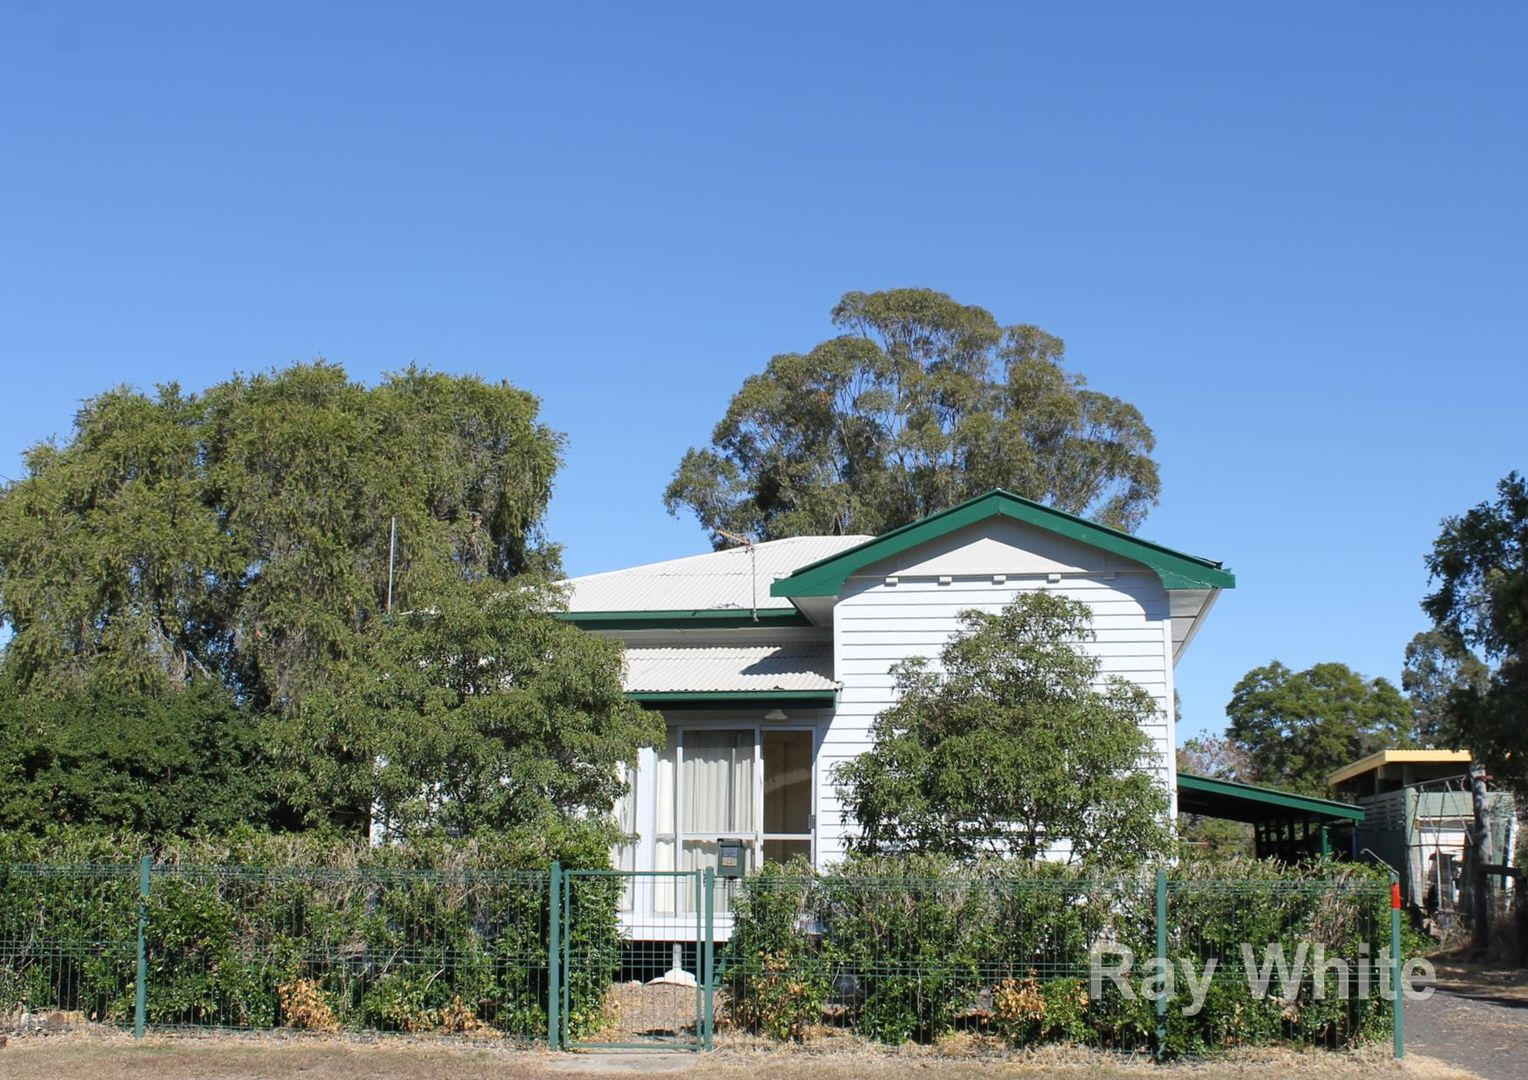 12 Besley Street, Dalby QLD 4405, Image 0